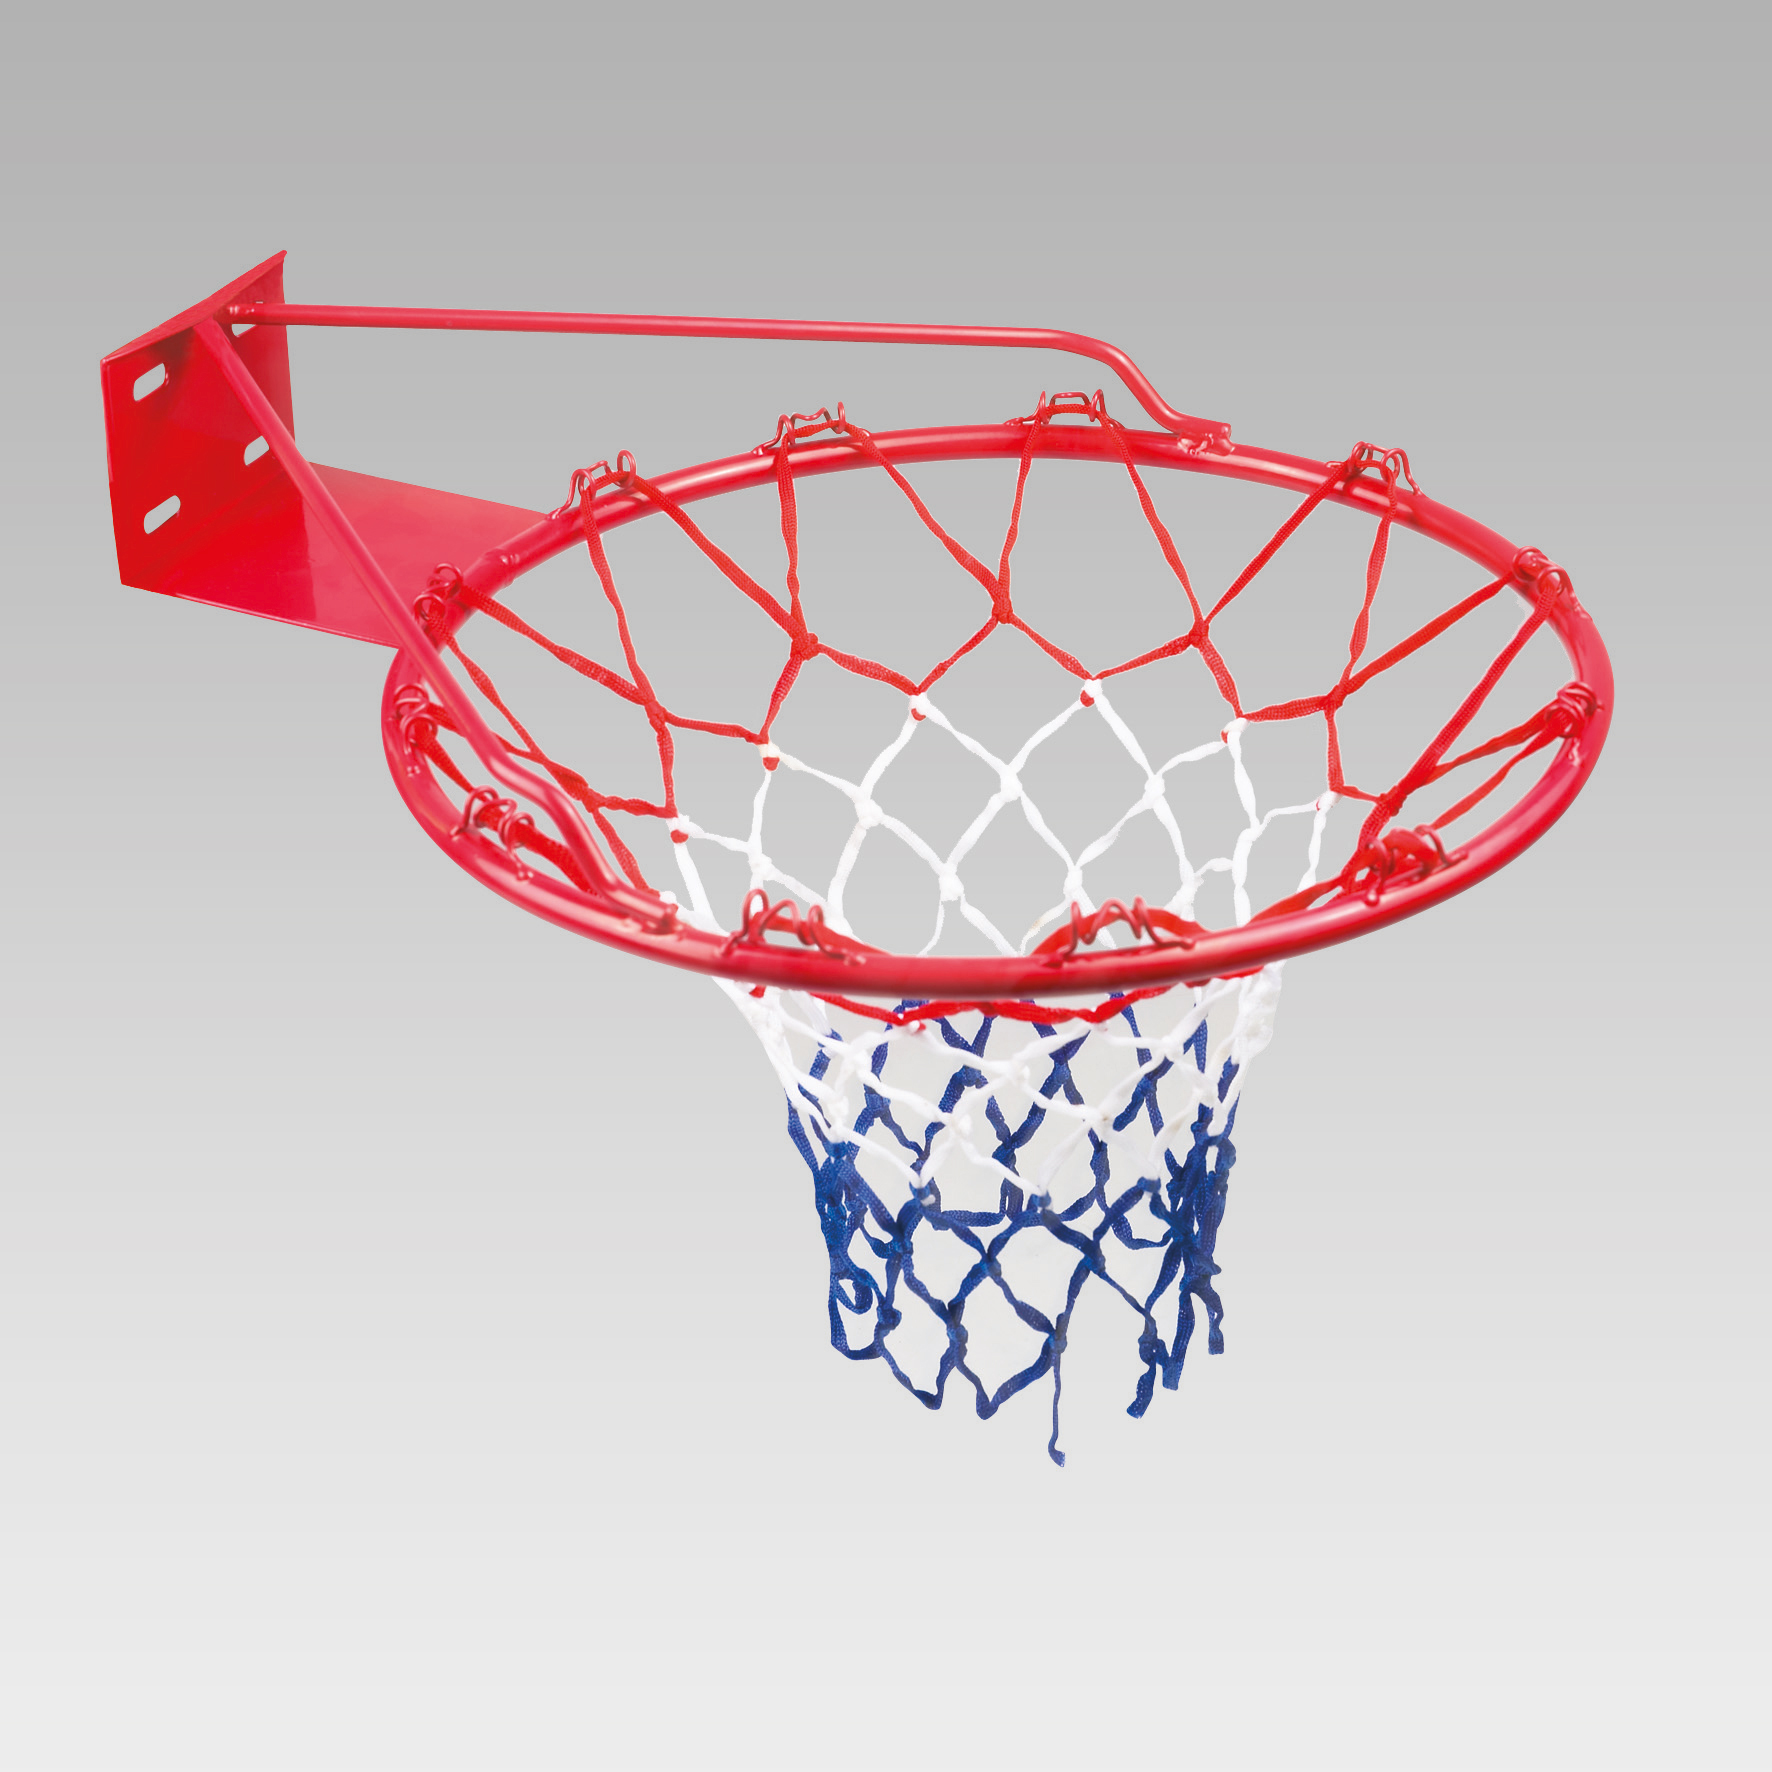 Basketball-Korb Standard mit Netz